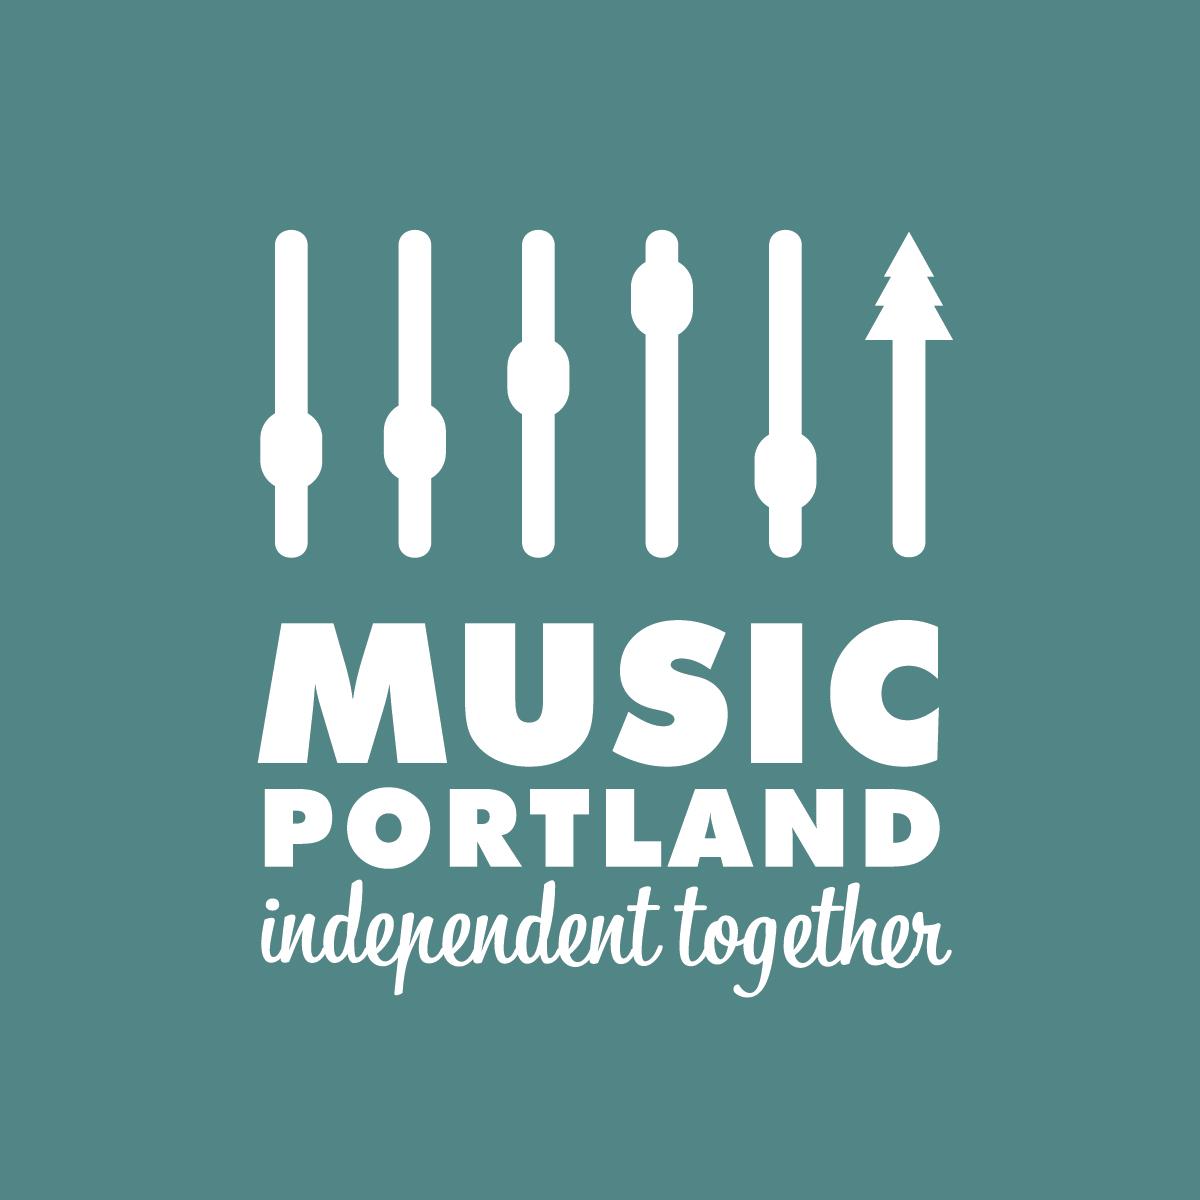 www.musicportland.org